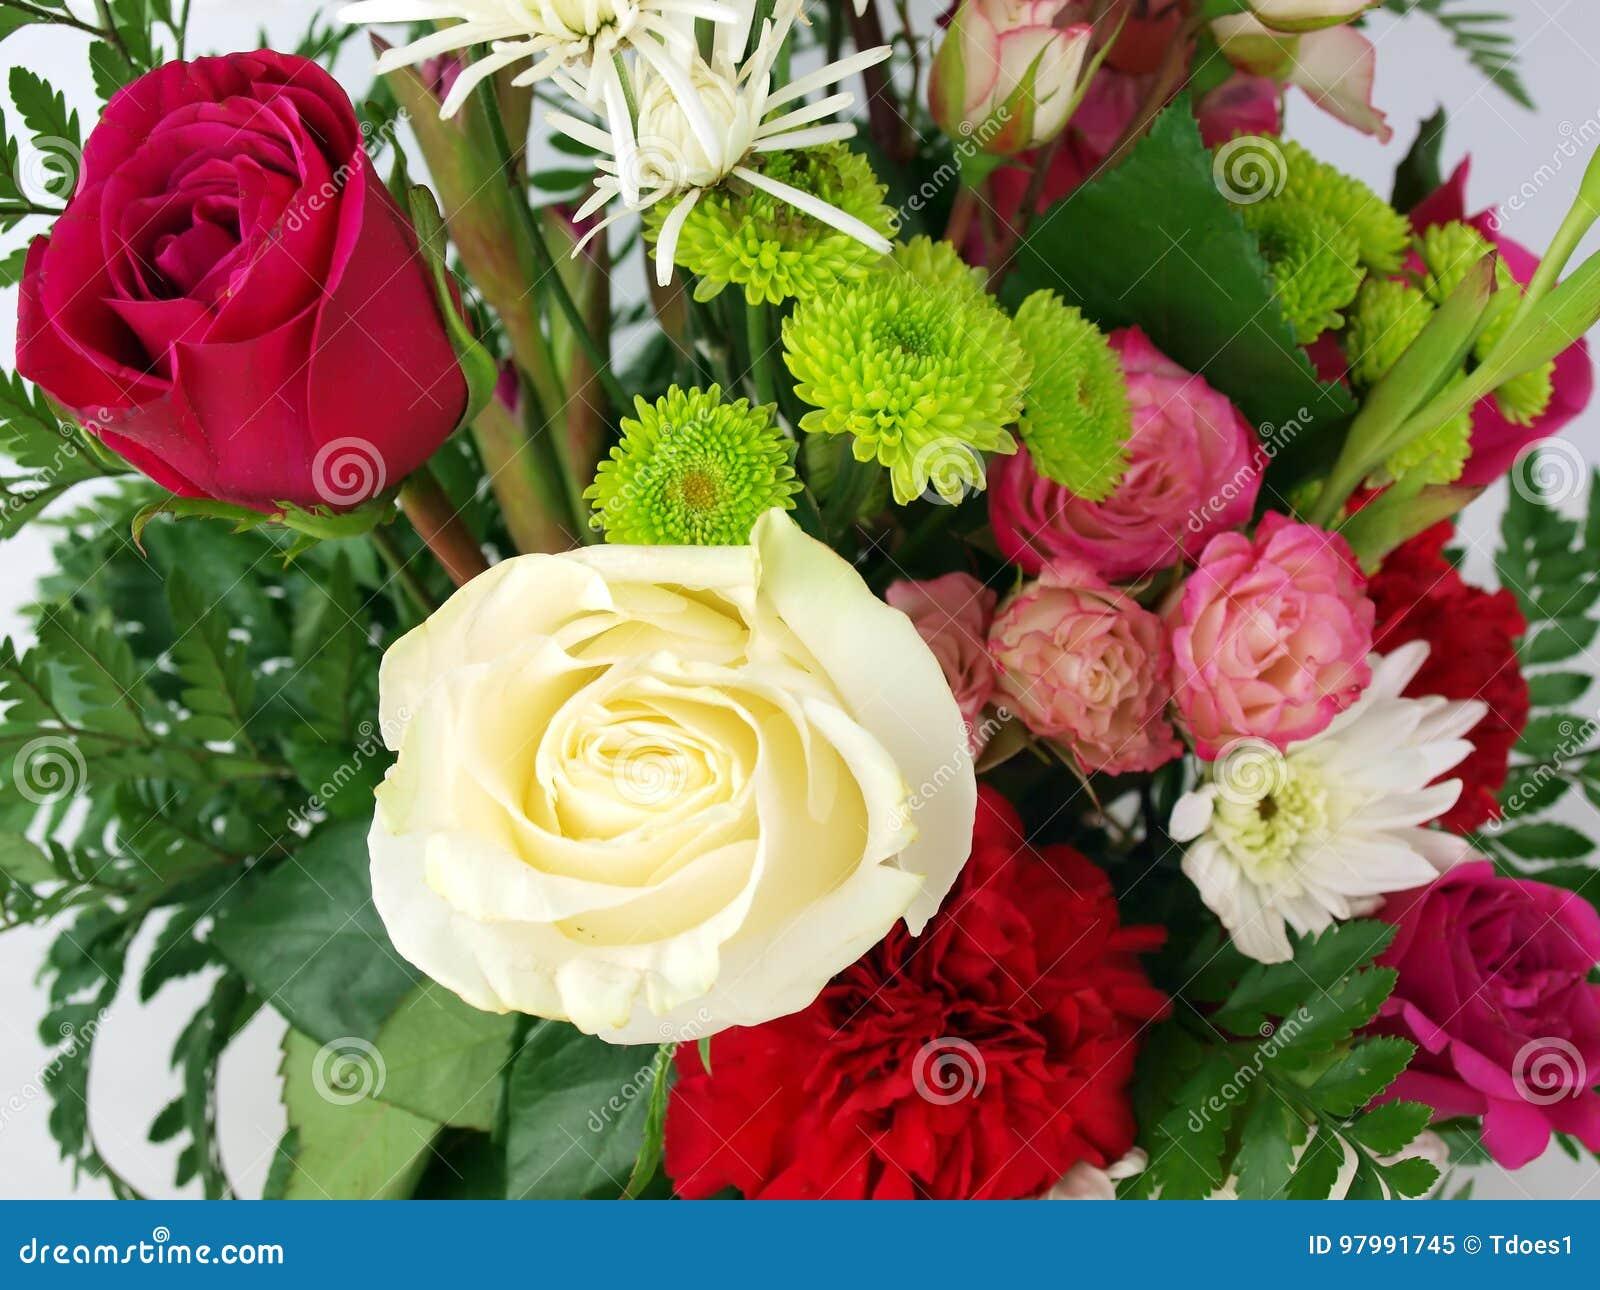 Flower Bouquet Rose Stock Image Image Of Spring Seasonal 97991745